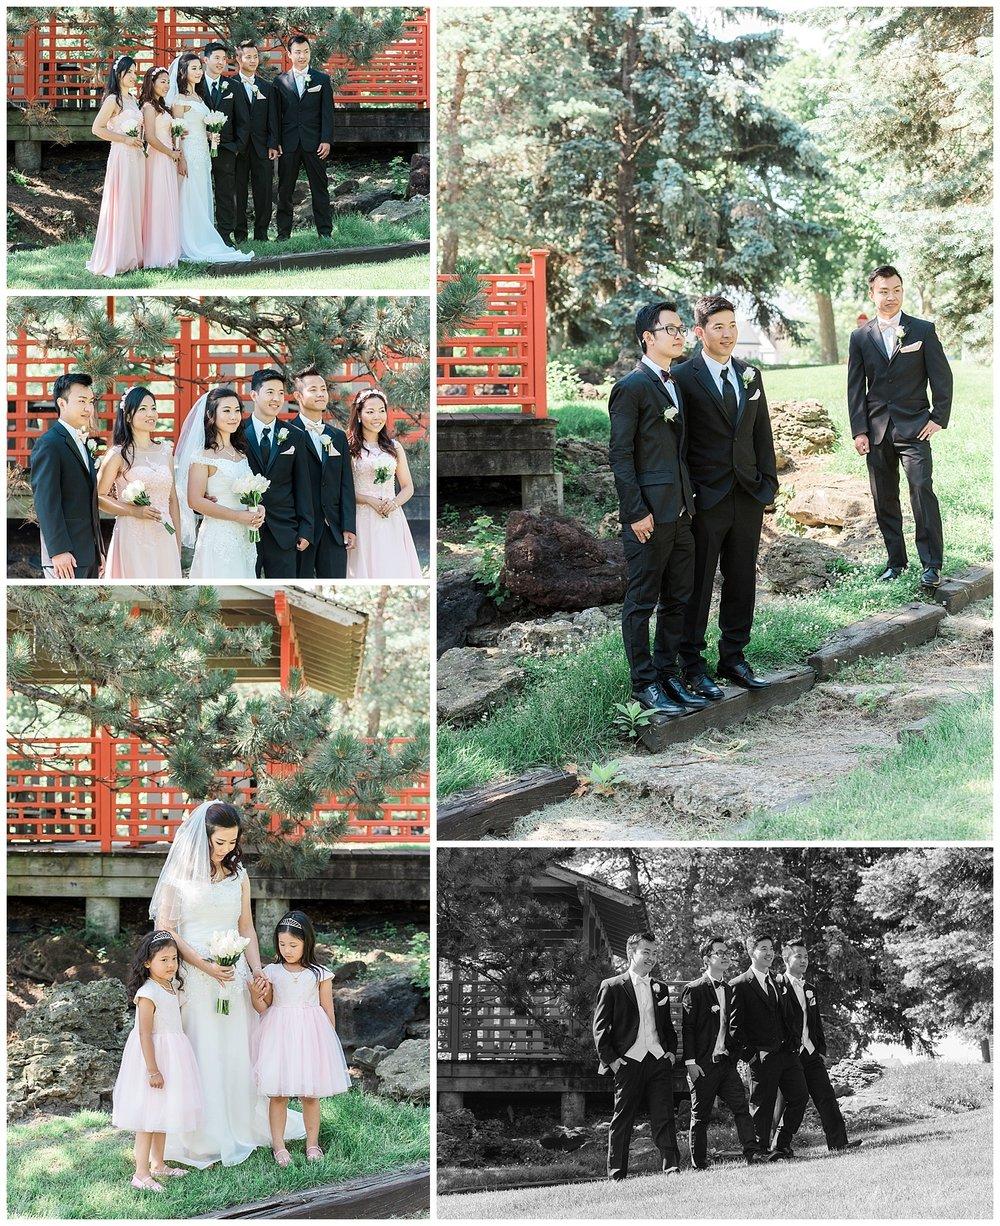 Burmese Wedding Nicole Corrine Iowa Wedding Photographer 21.jpg